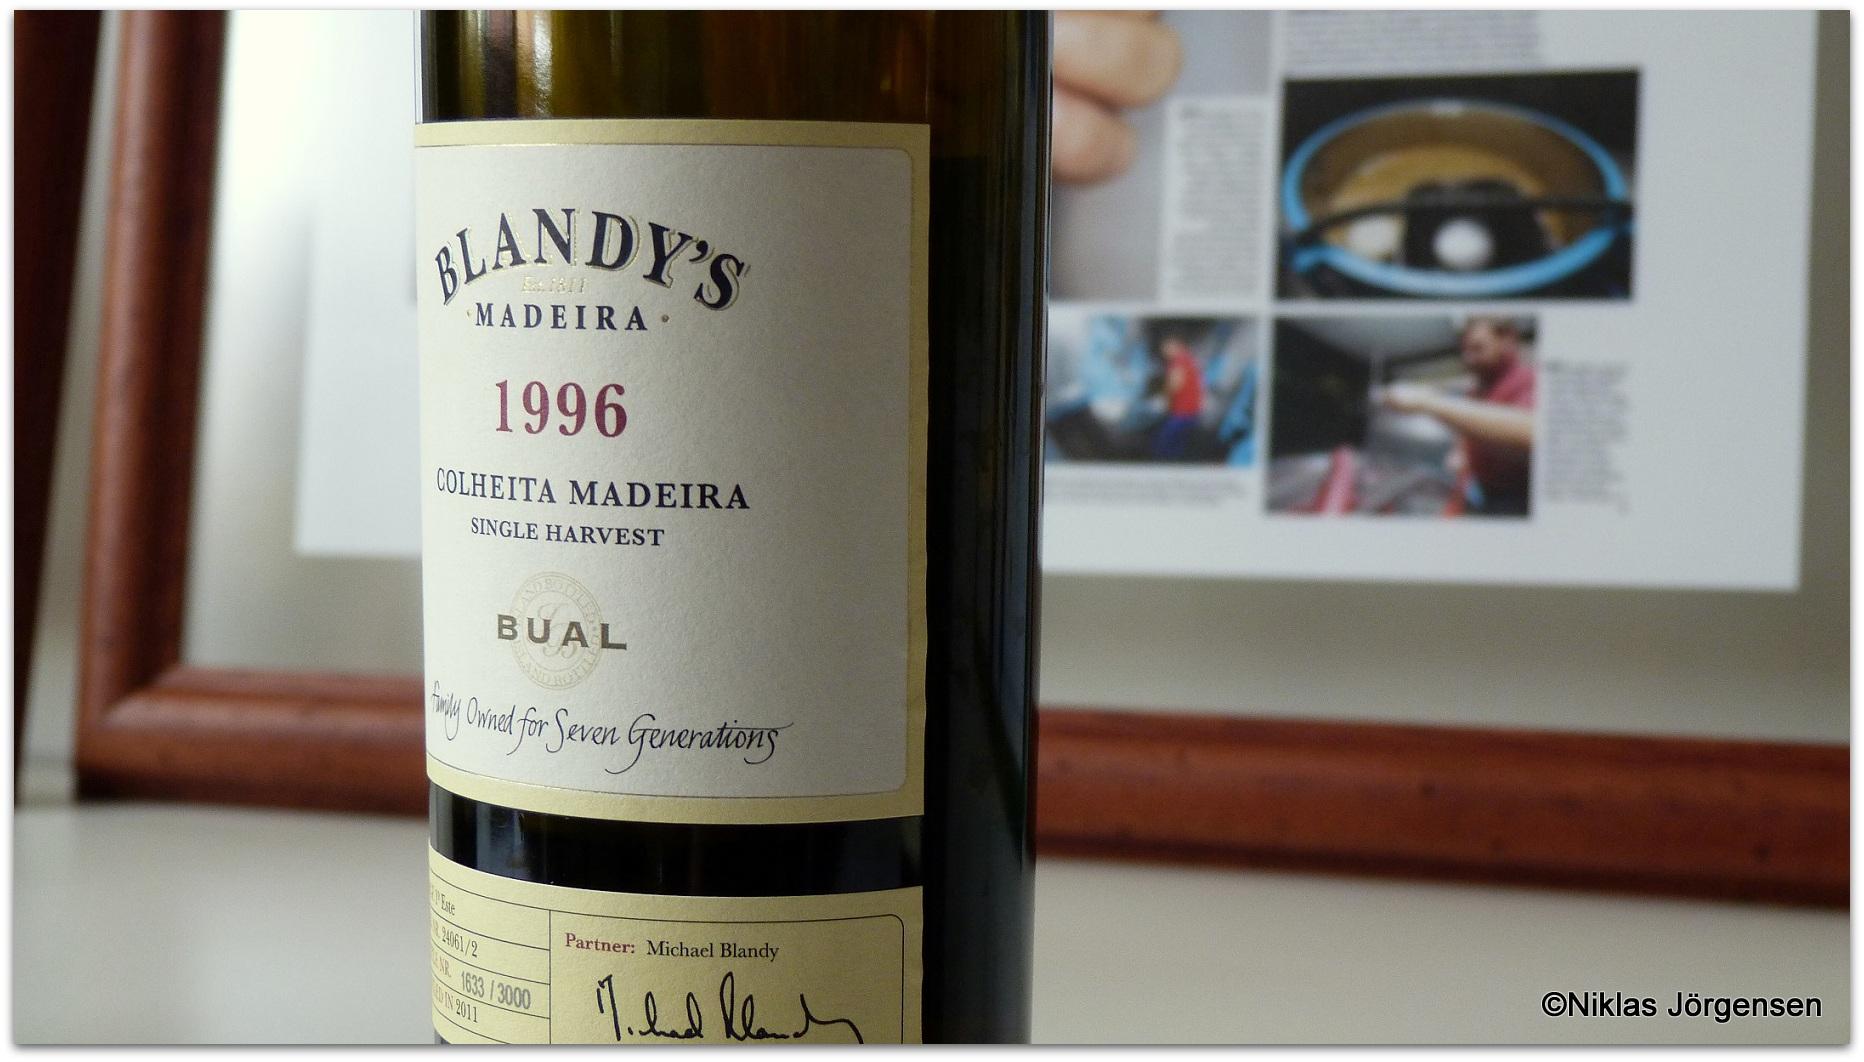 Blandy's 1996 Bual Colheita